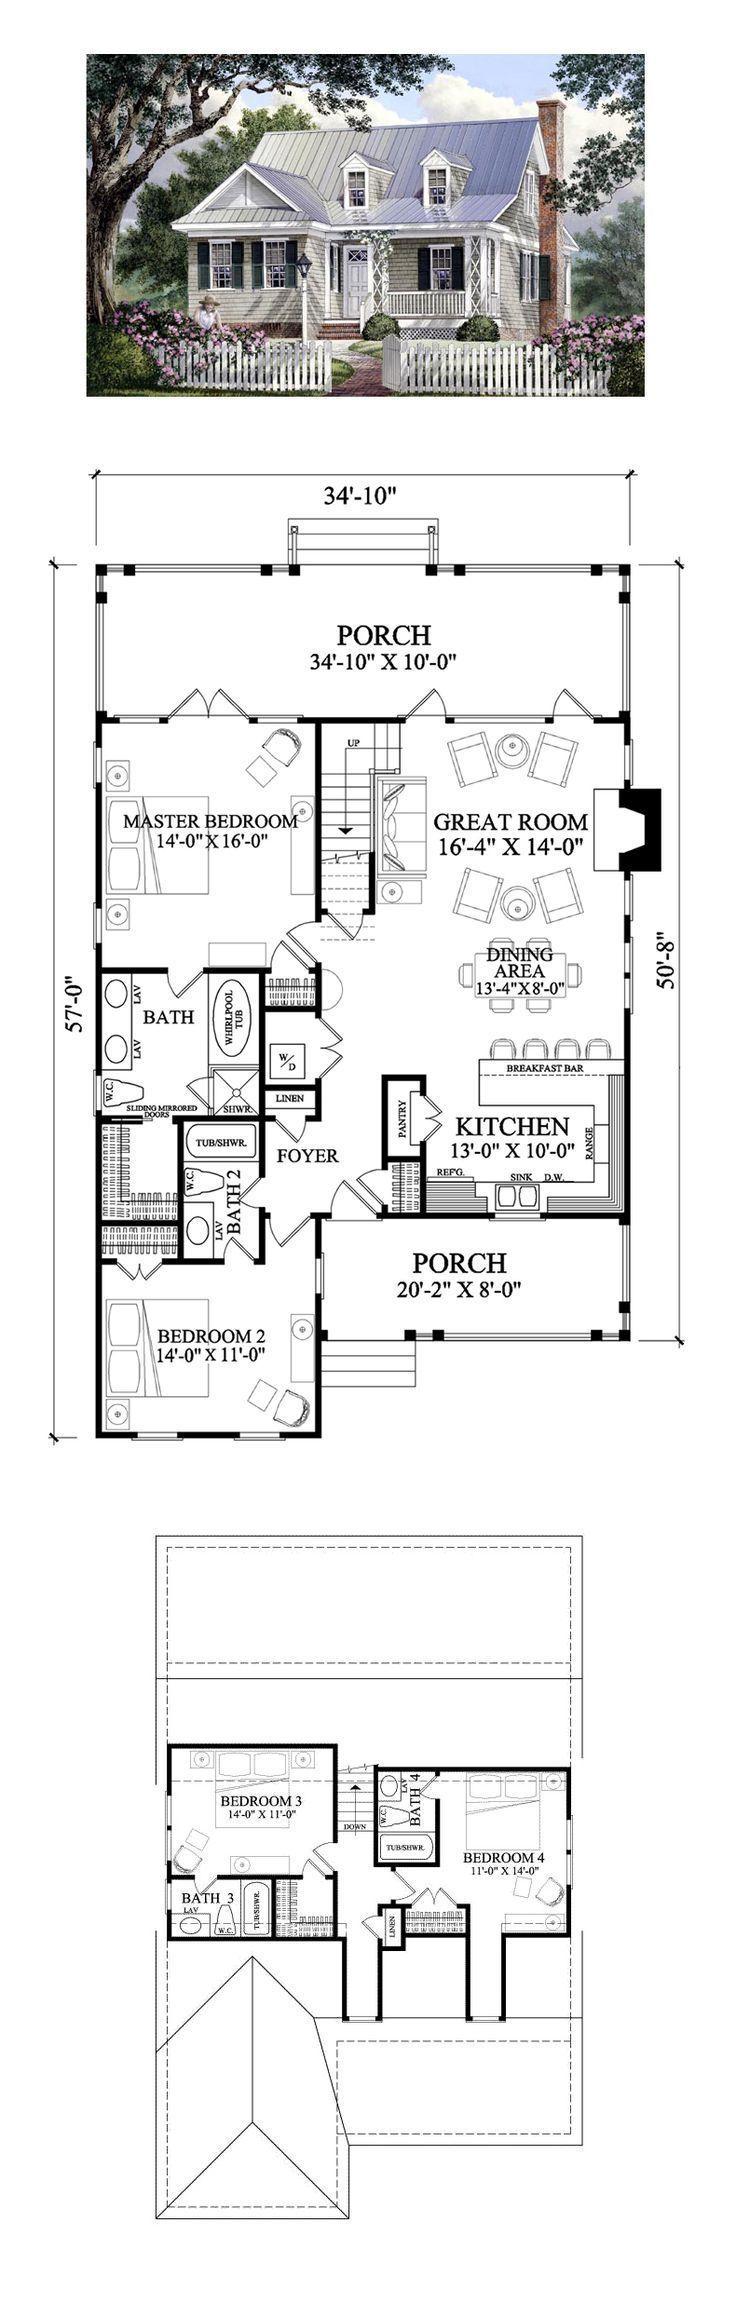 25 best ideas about cape cod houses on pinterest cape for Cape cod floor plans with loft